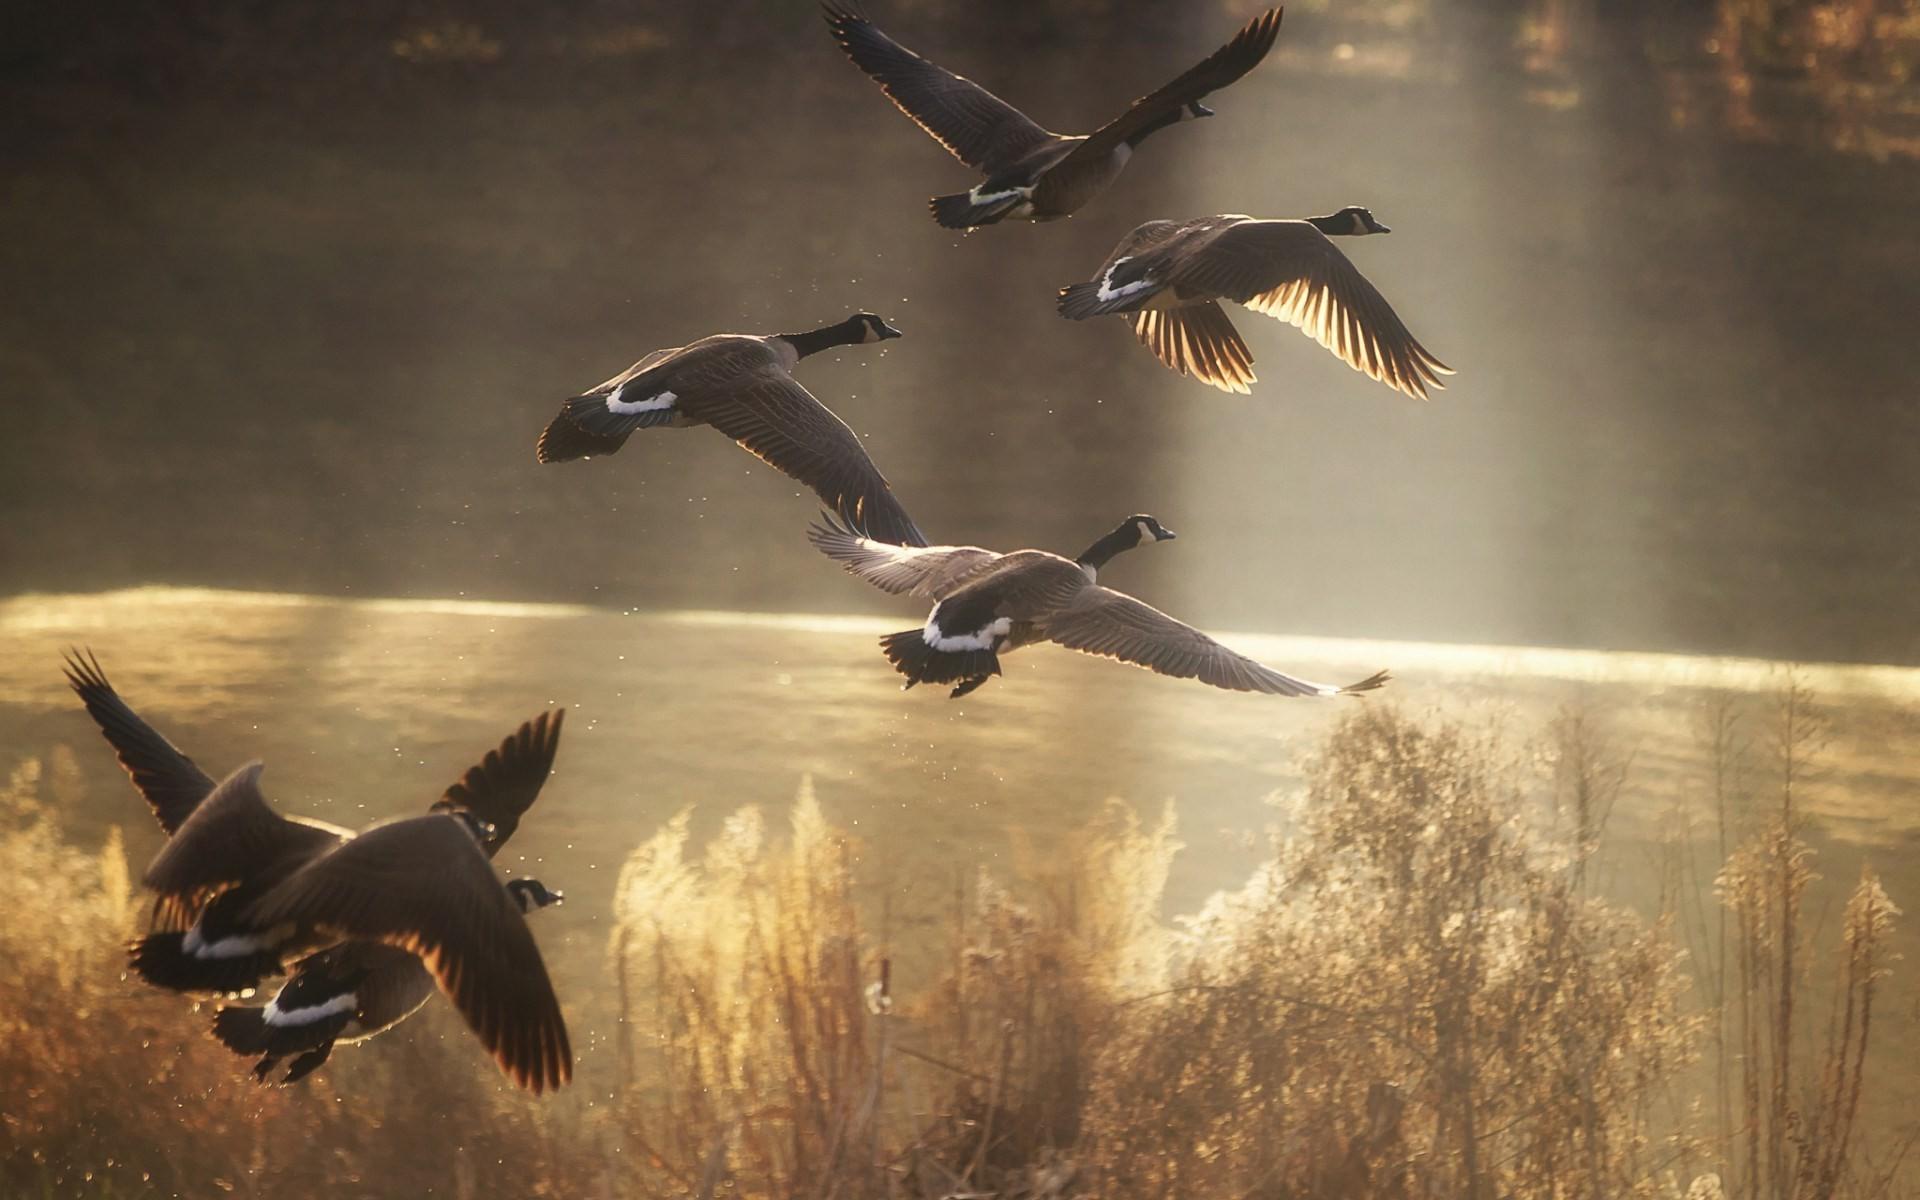 Sunlight Birds Flying Wildlife Duck Goose Geese Flight Bird Wing Screenshot 1920x1200 Px Waterfowl Vertebrate Water